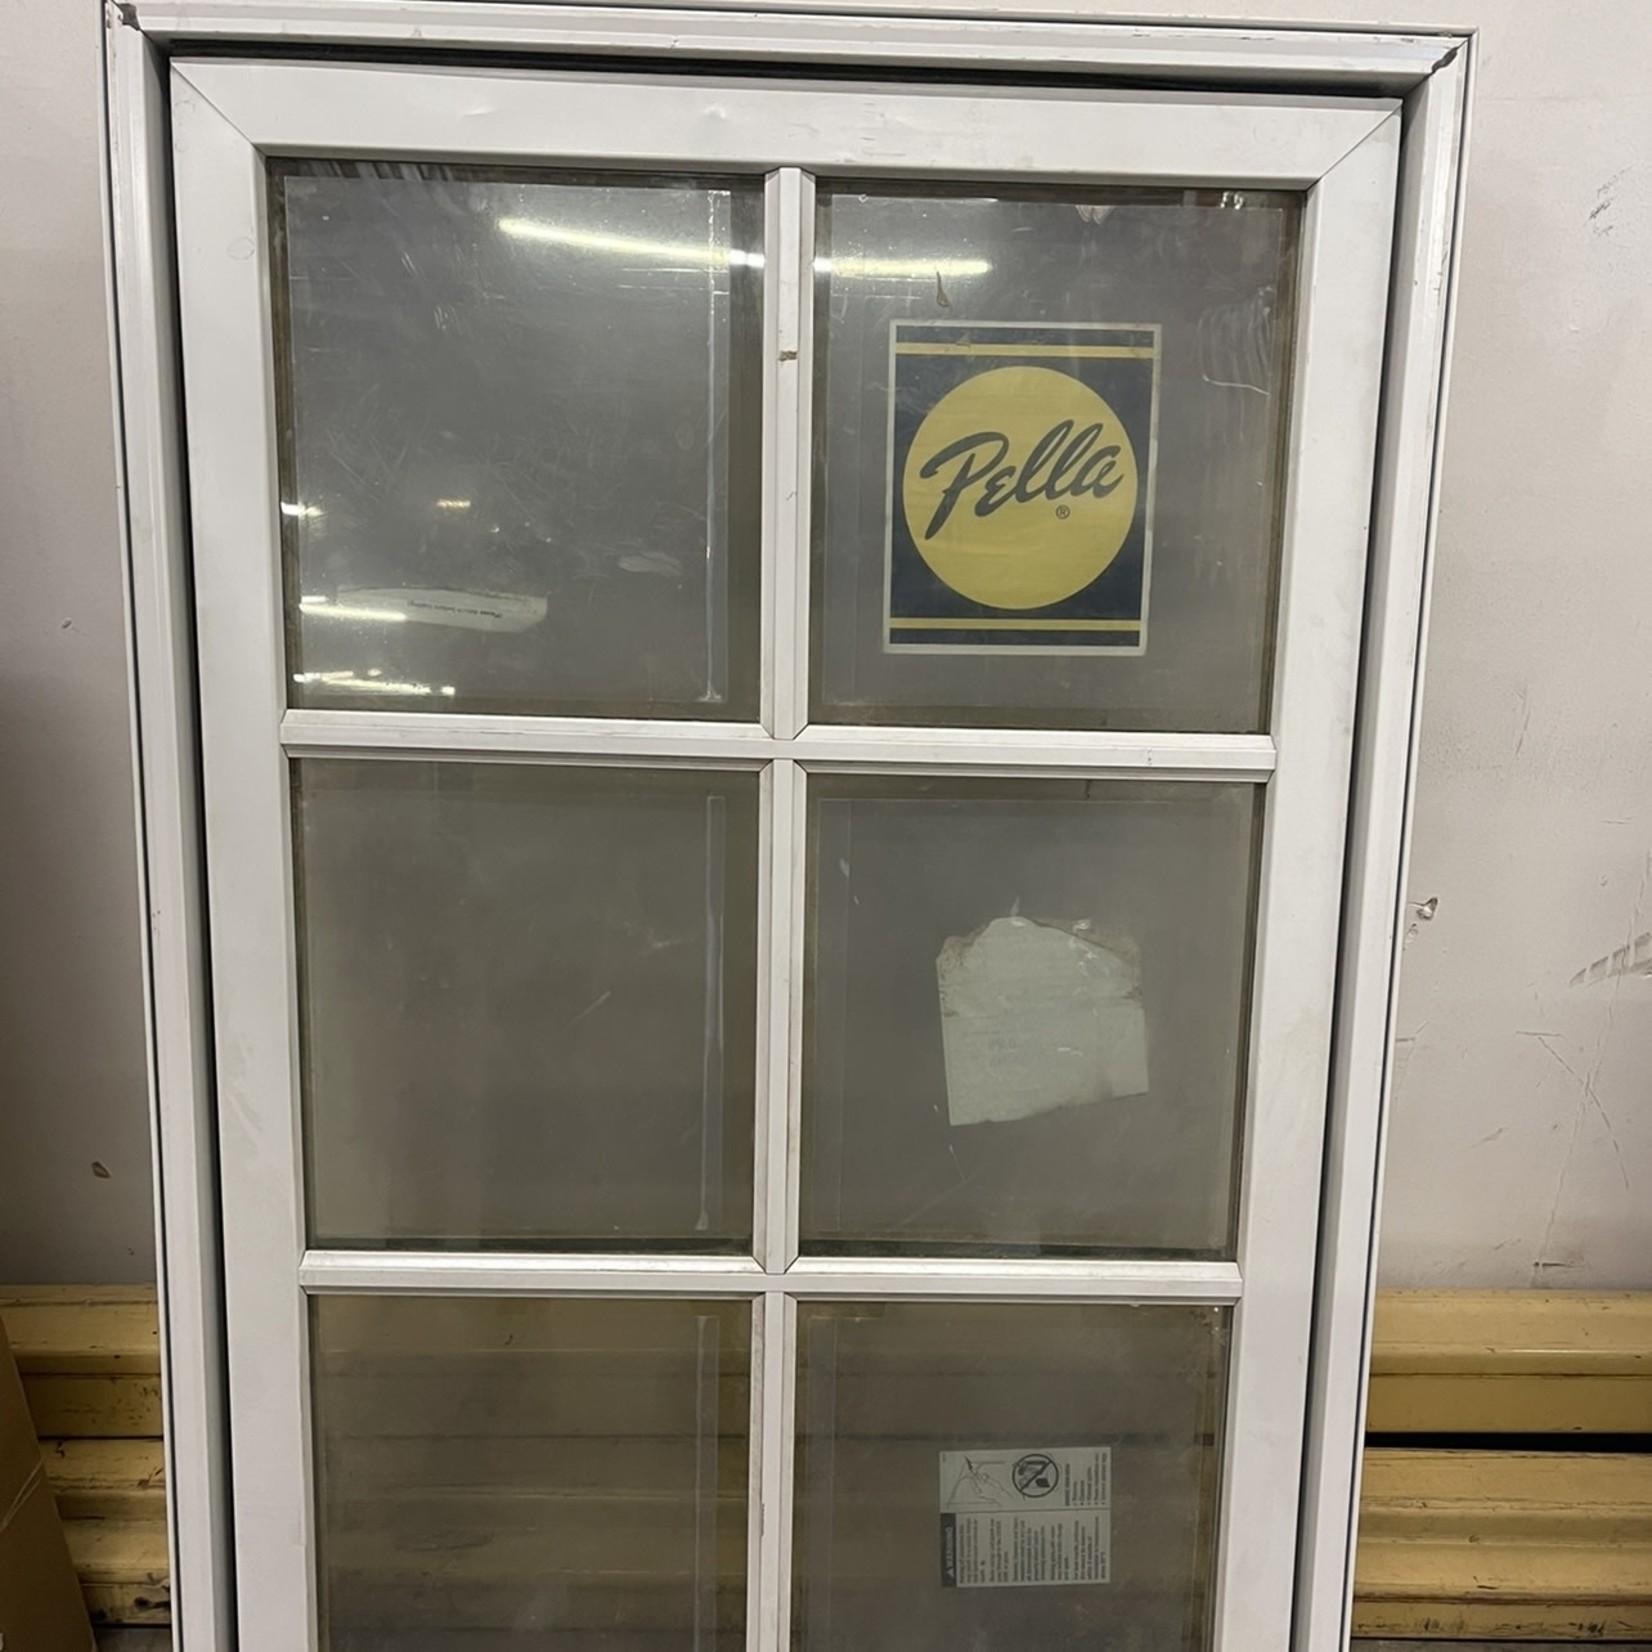 10208 Pell 6 Pane Casement Window